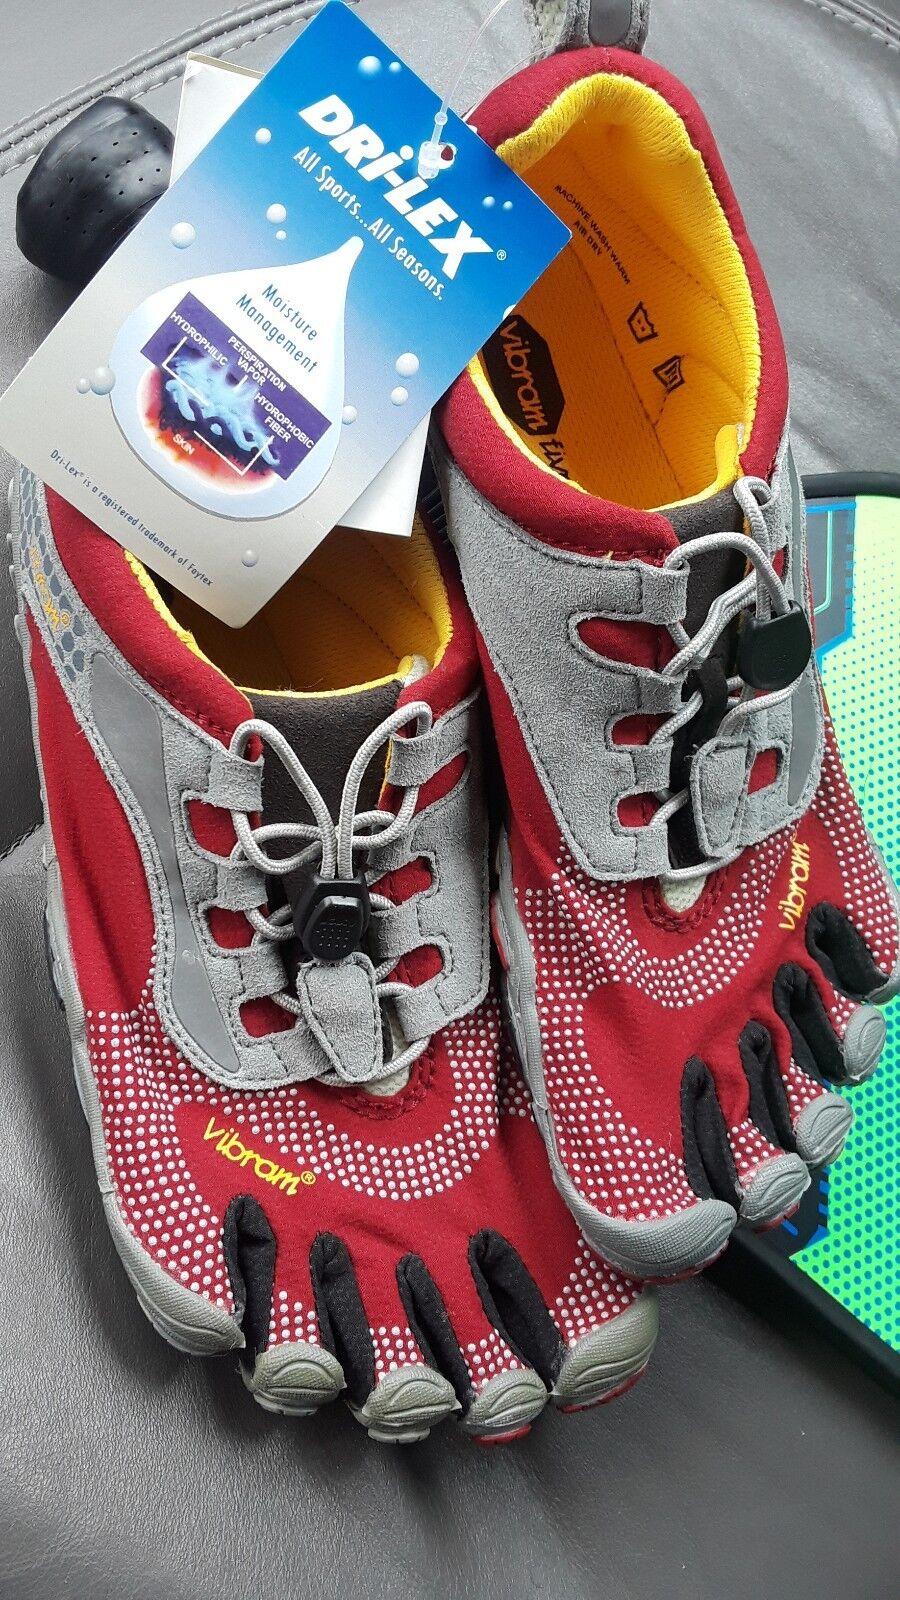 Vibram Fivefingers Bikila W3535 mujer mujer mujer talla 42 US 11 gris correr descalzo Rojo  a la venta